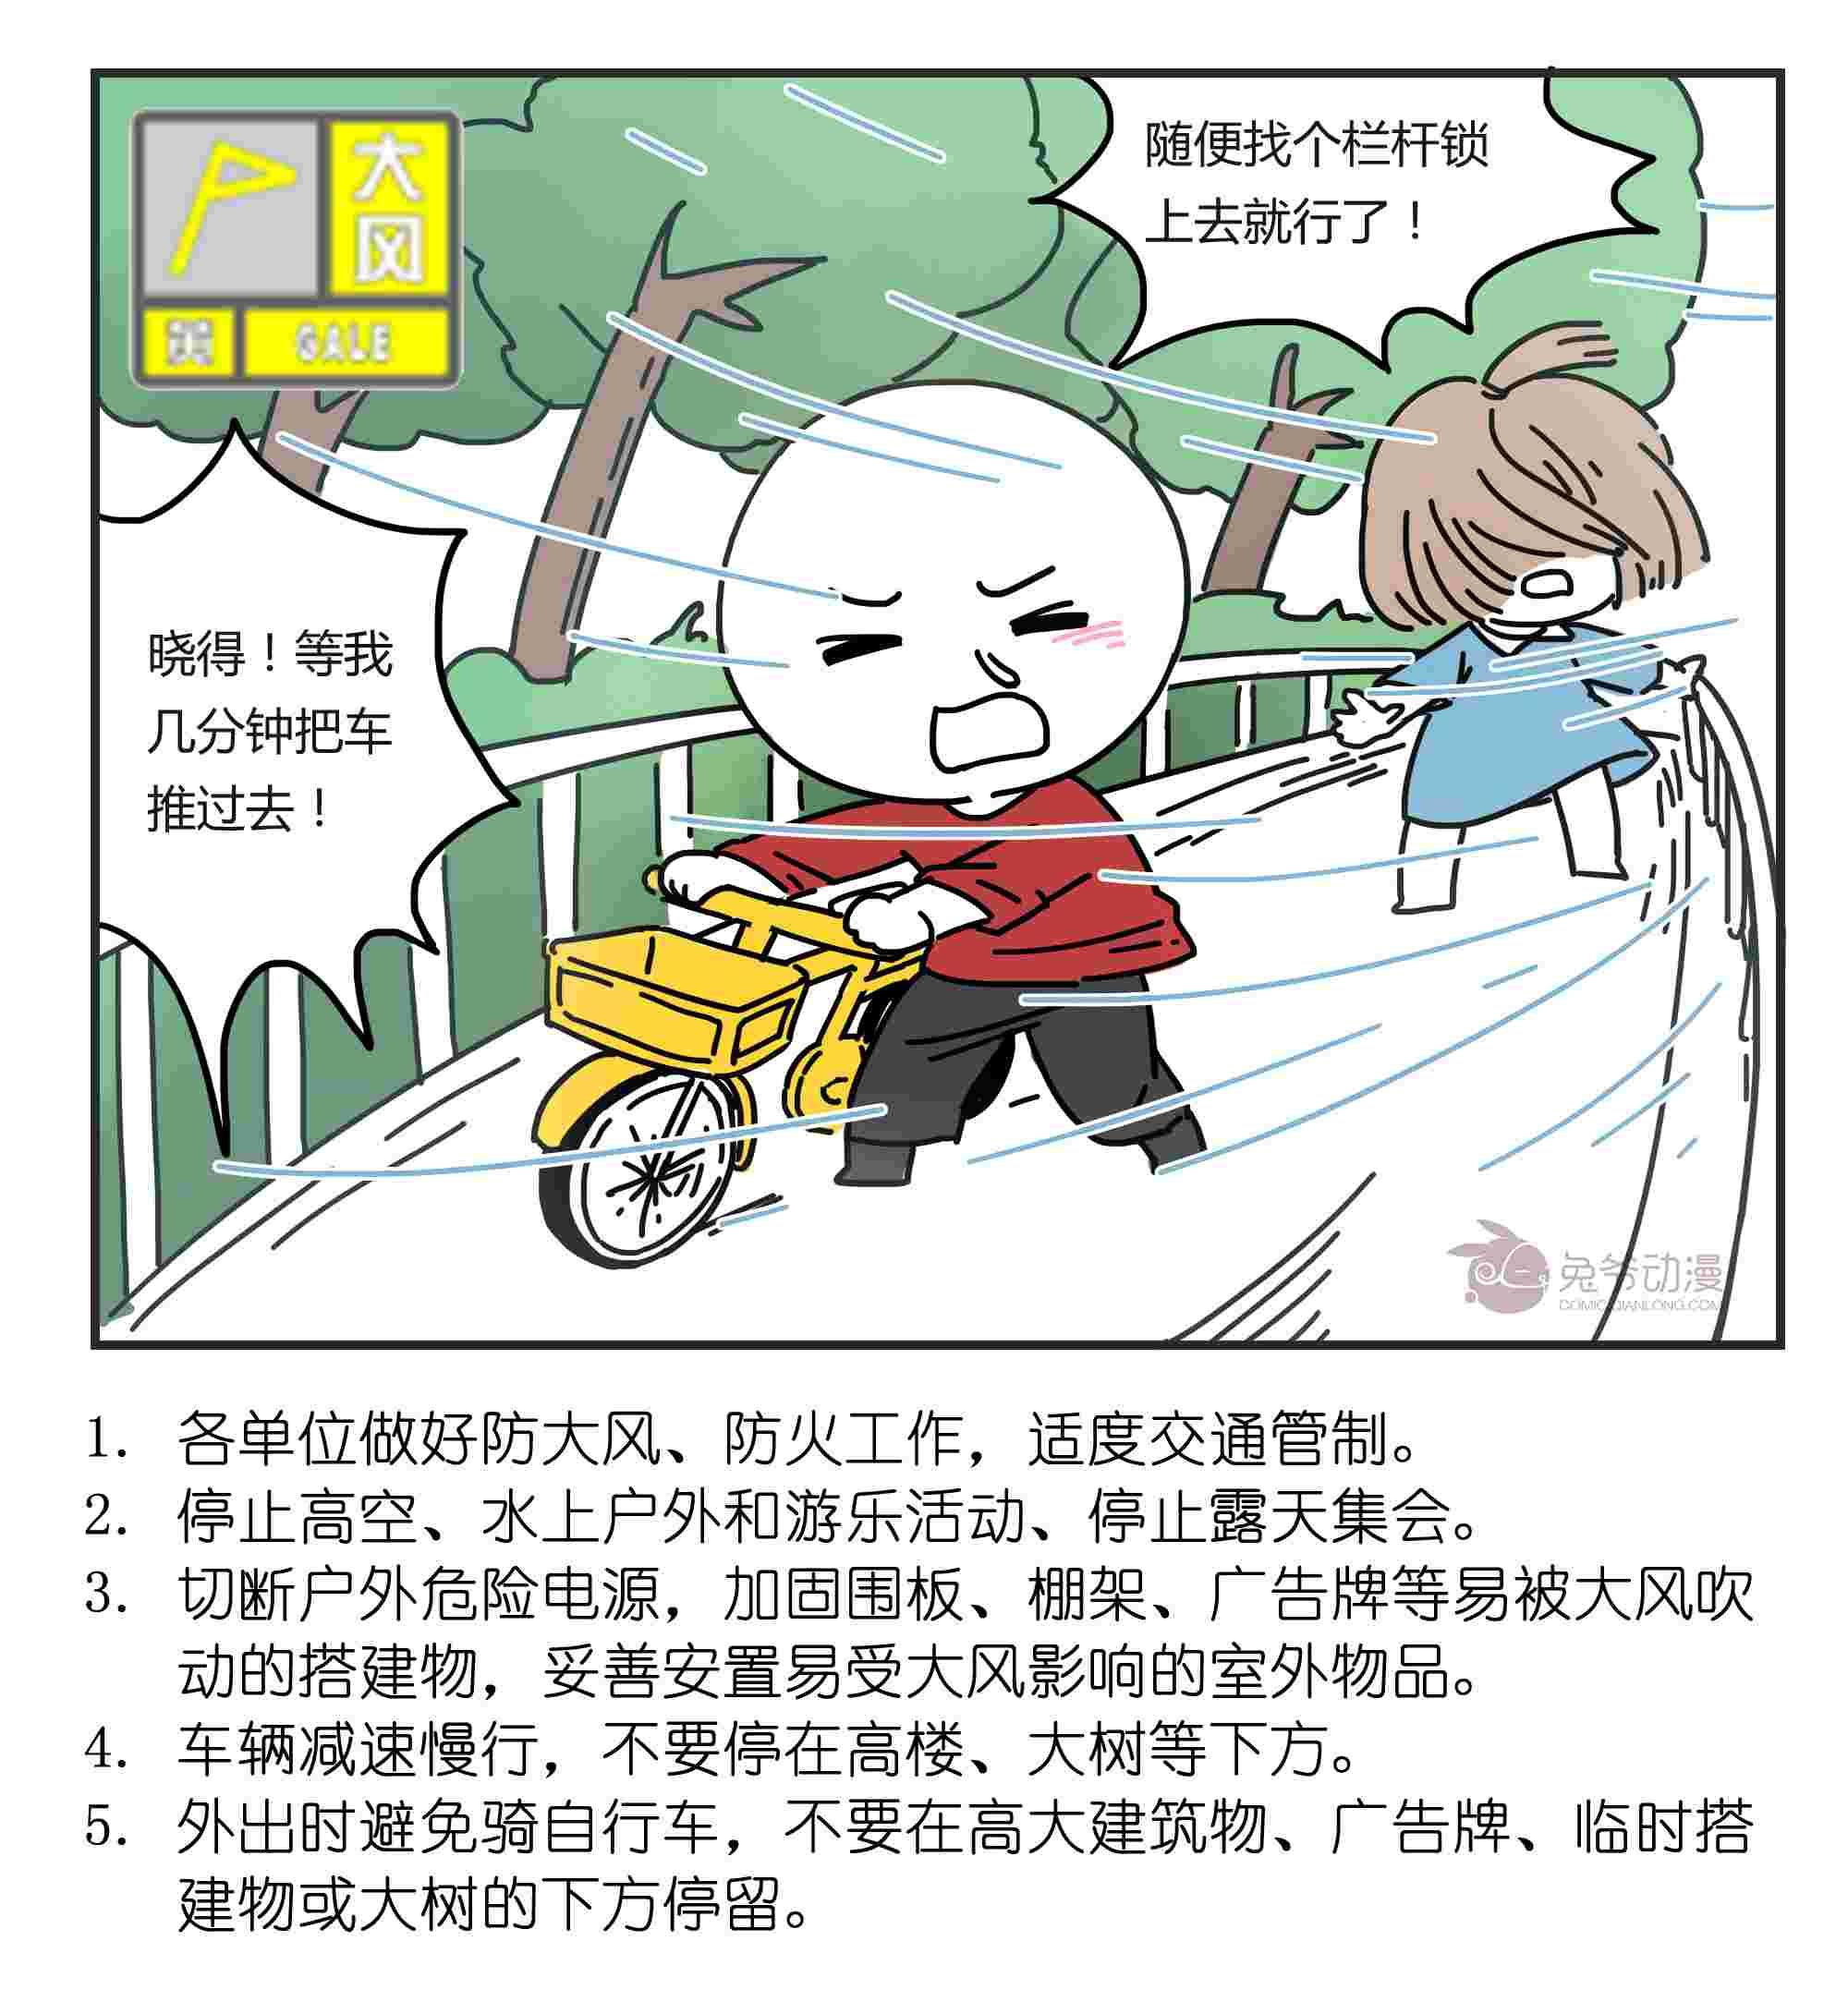 usdt支付平台(www.caibao.it):北京市气象台2021年1月5日16时30分公布大风黄色预警信号